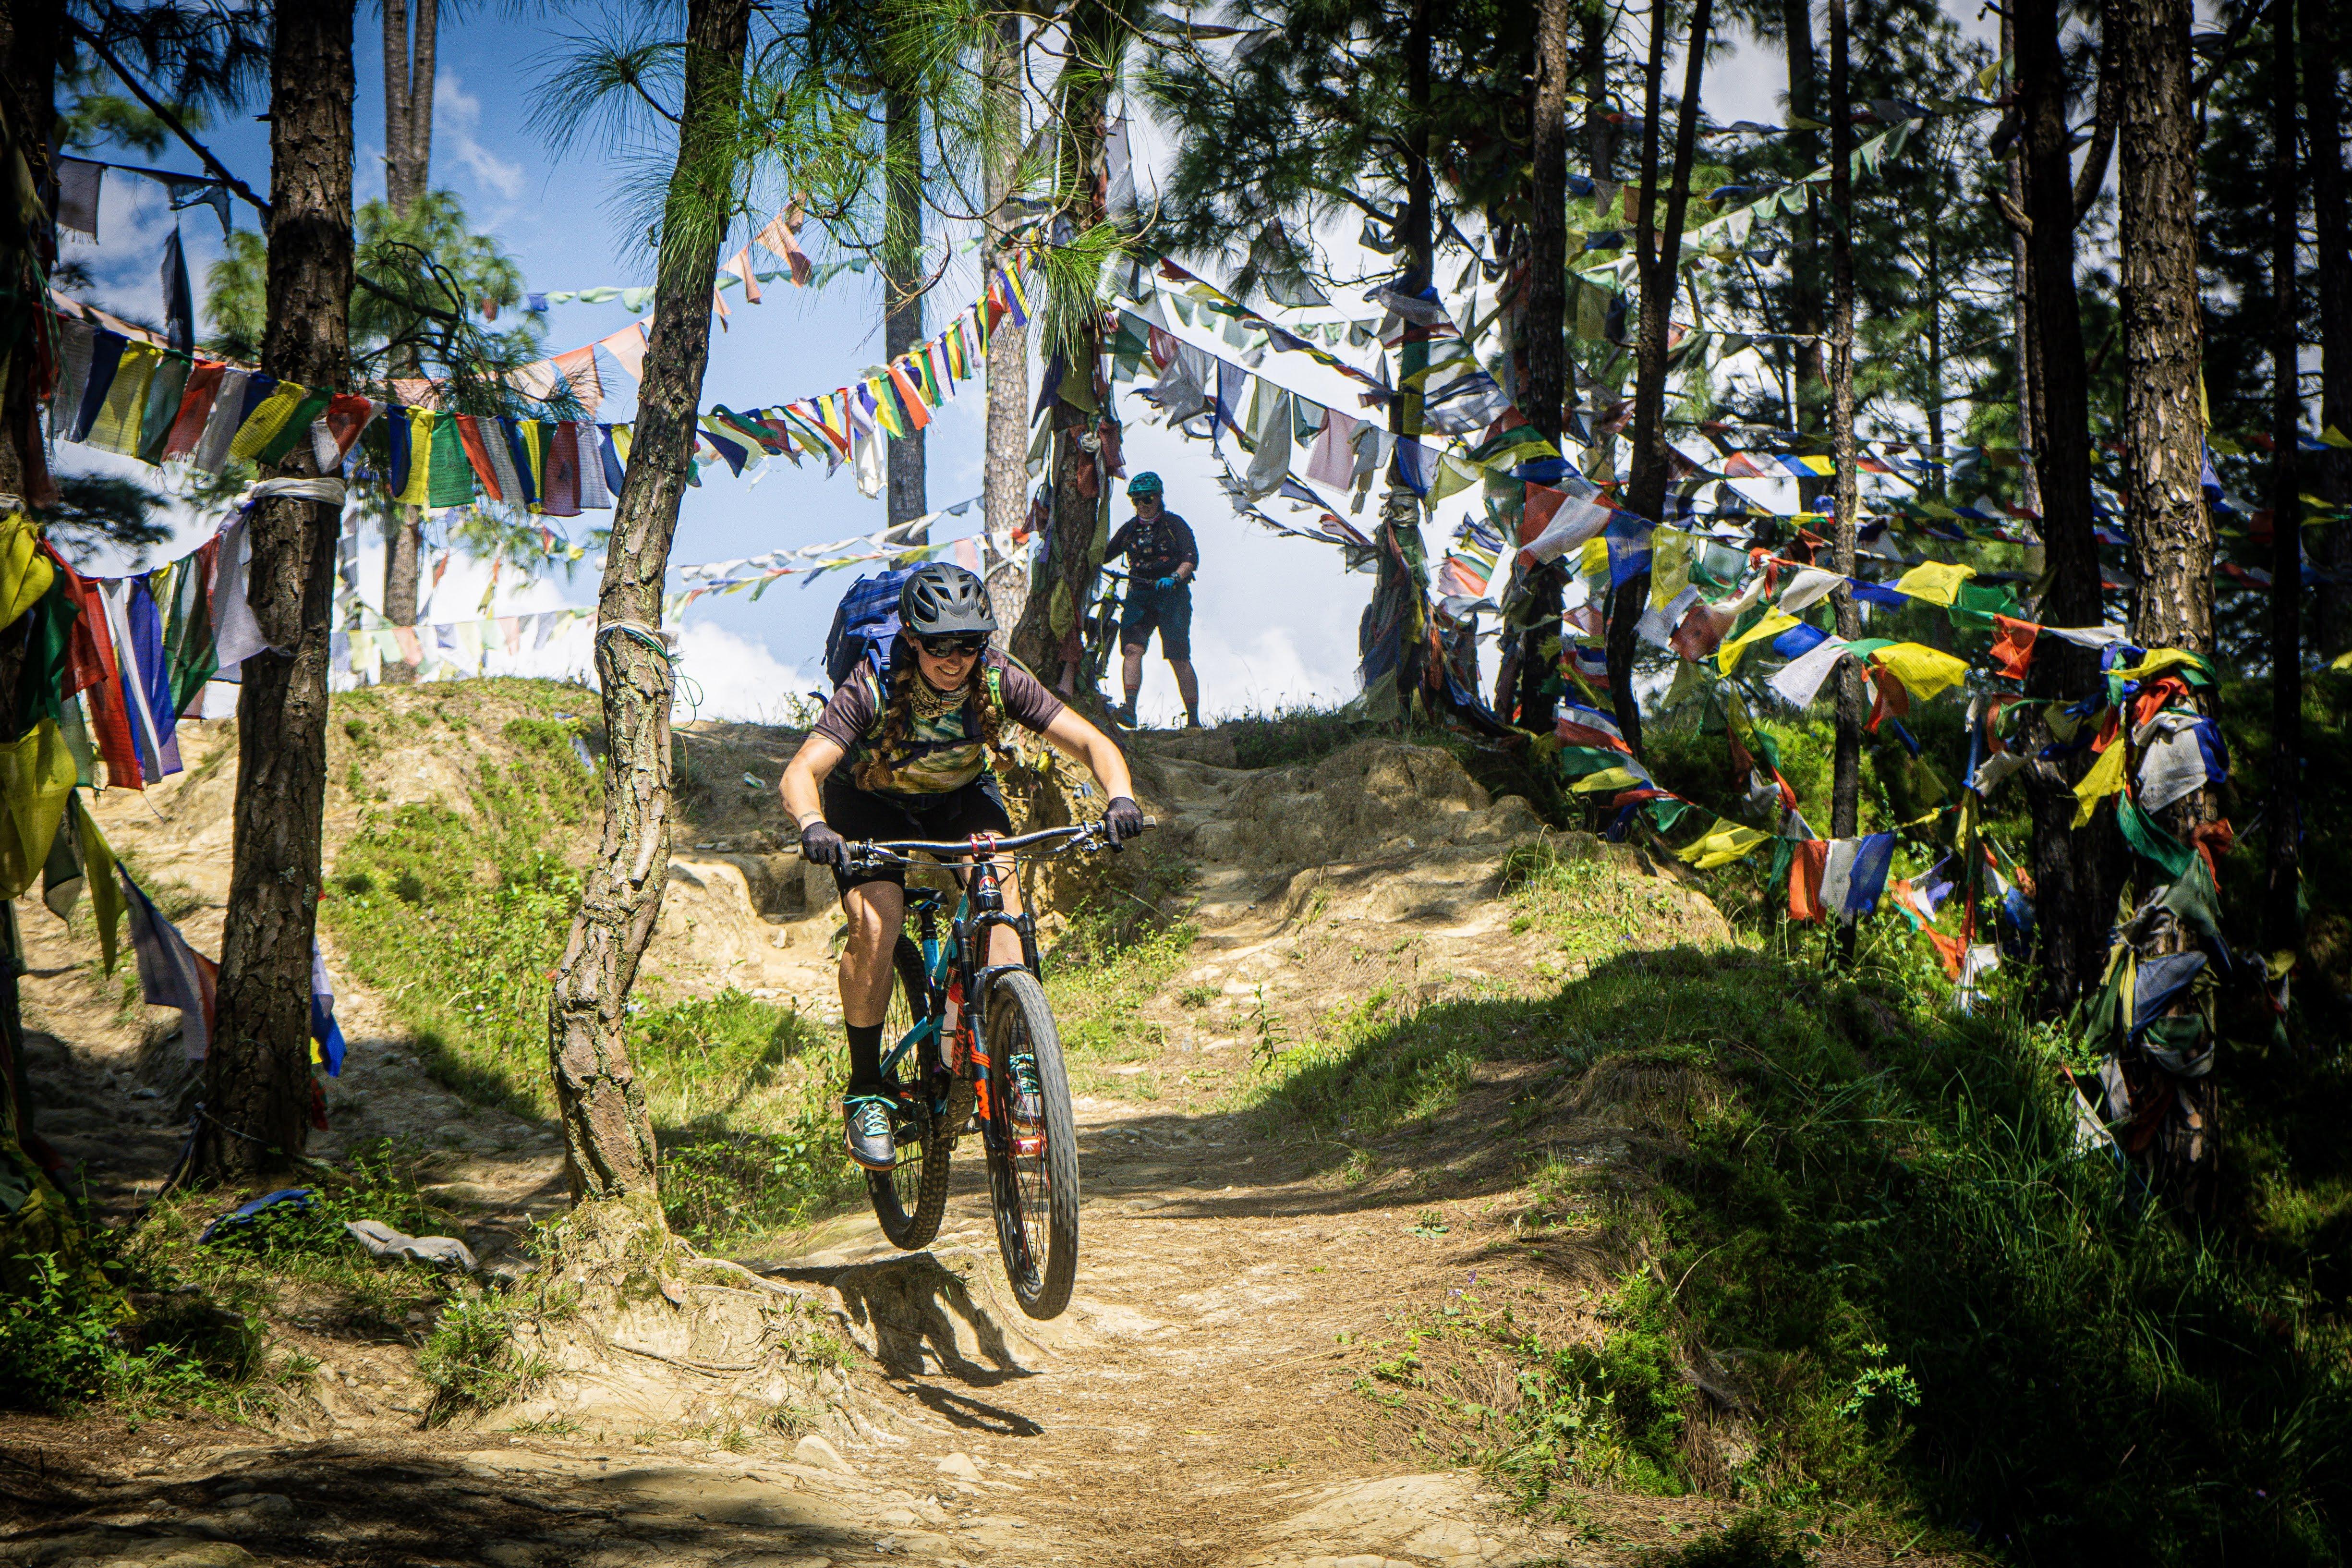 mountain-bike-gage-dirtbagdreams.com